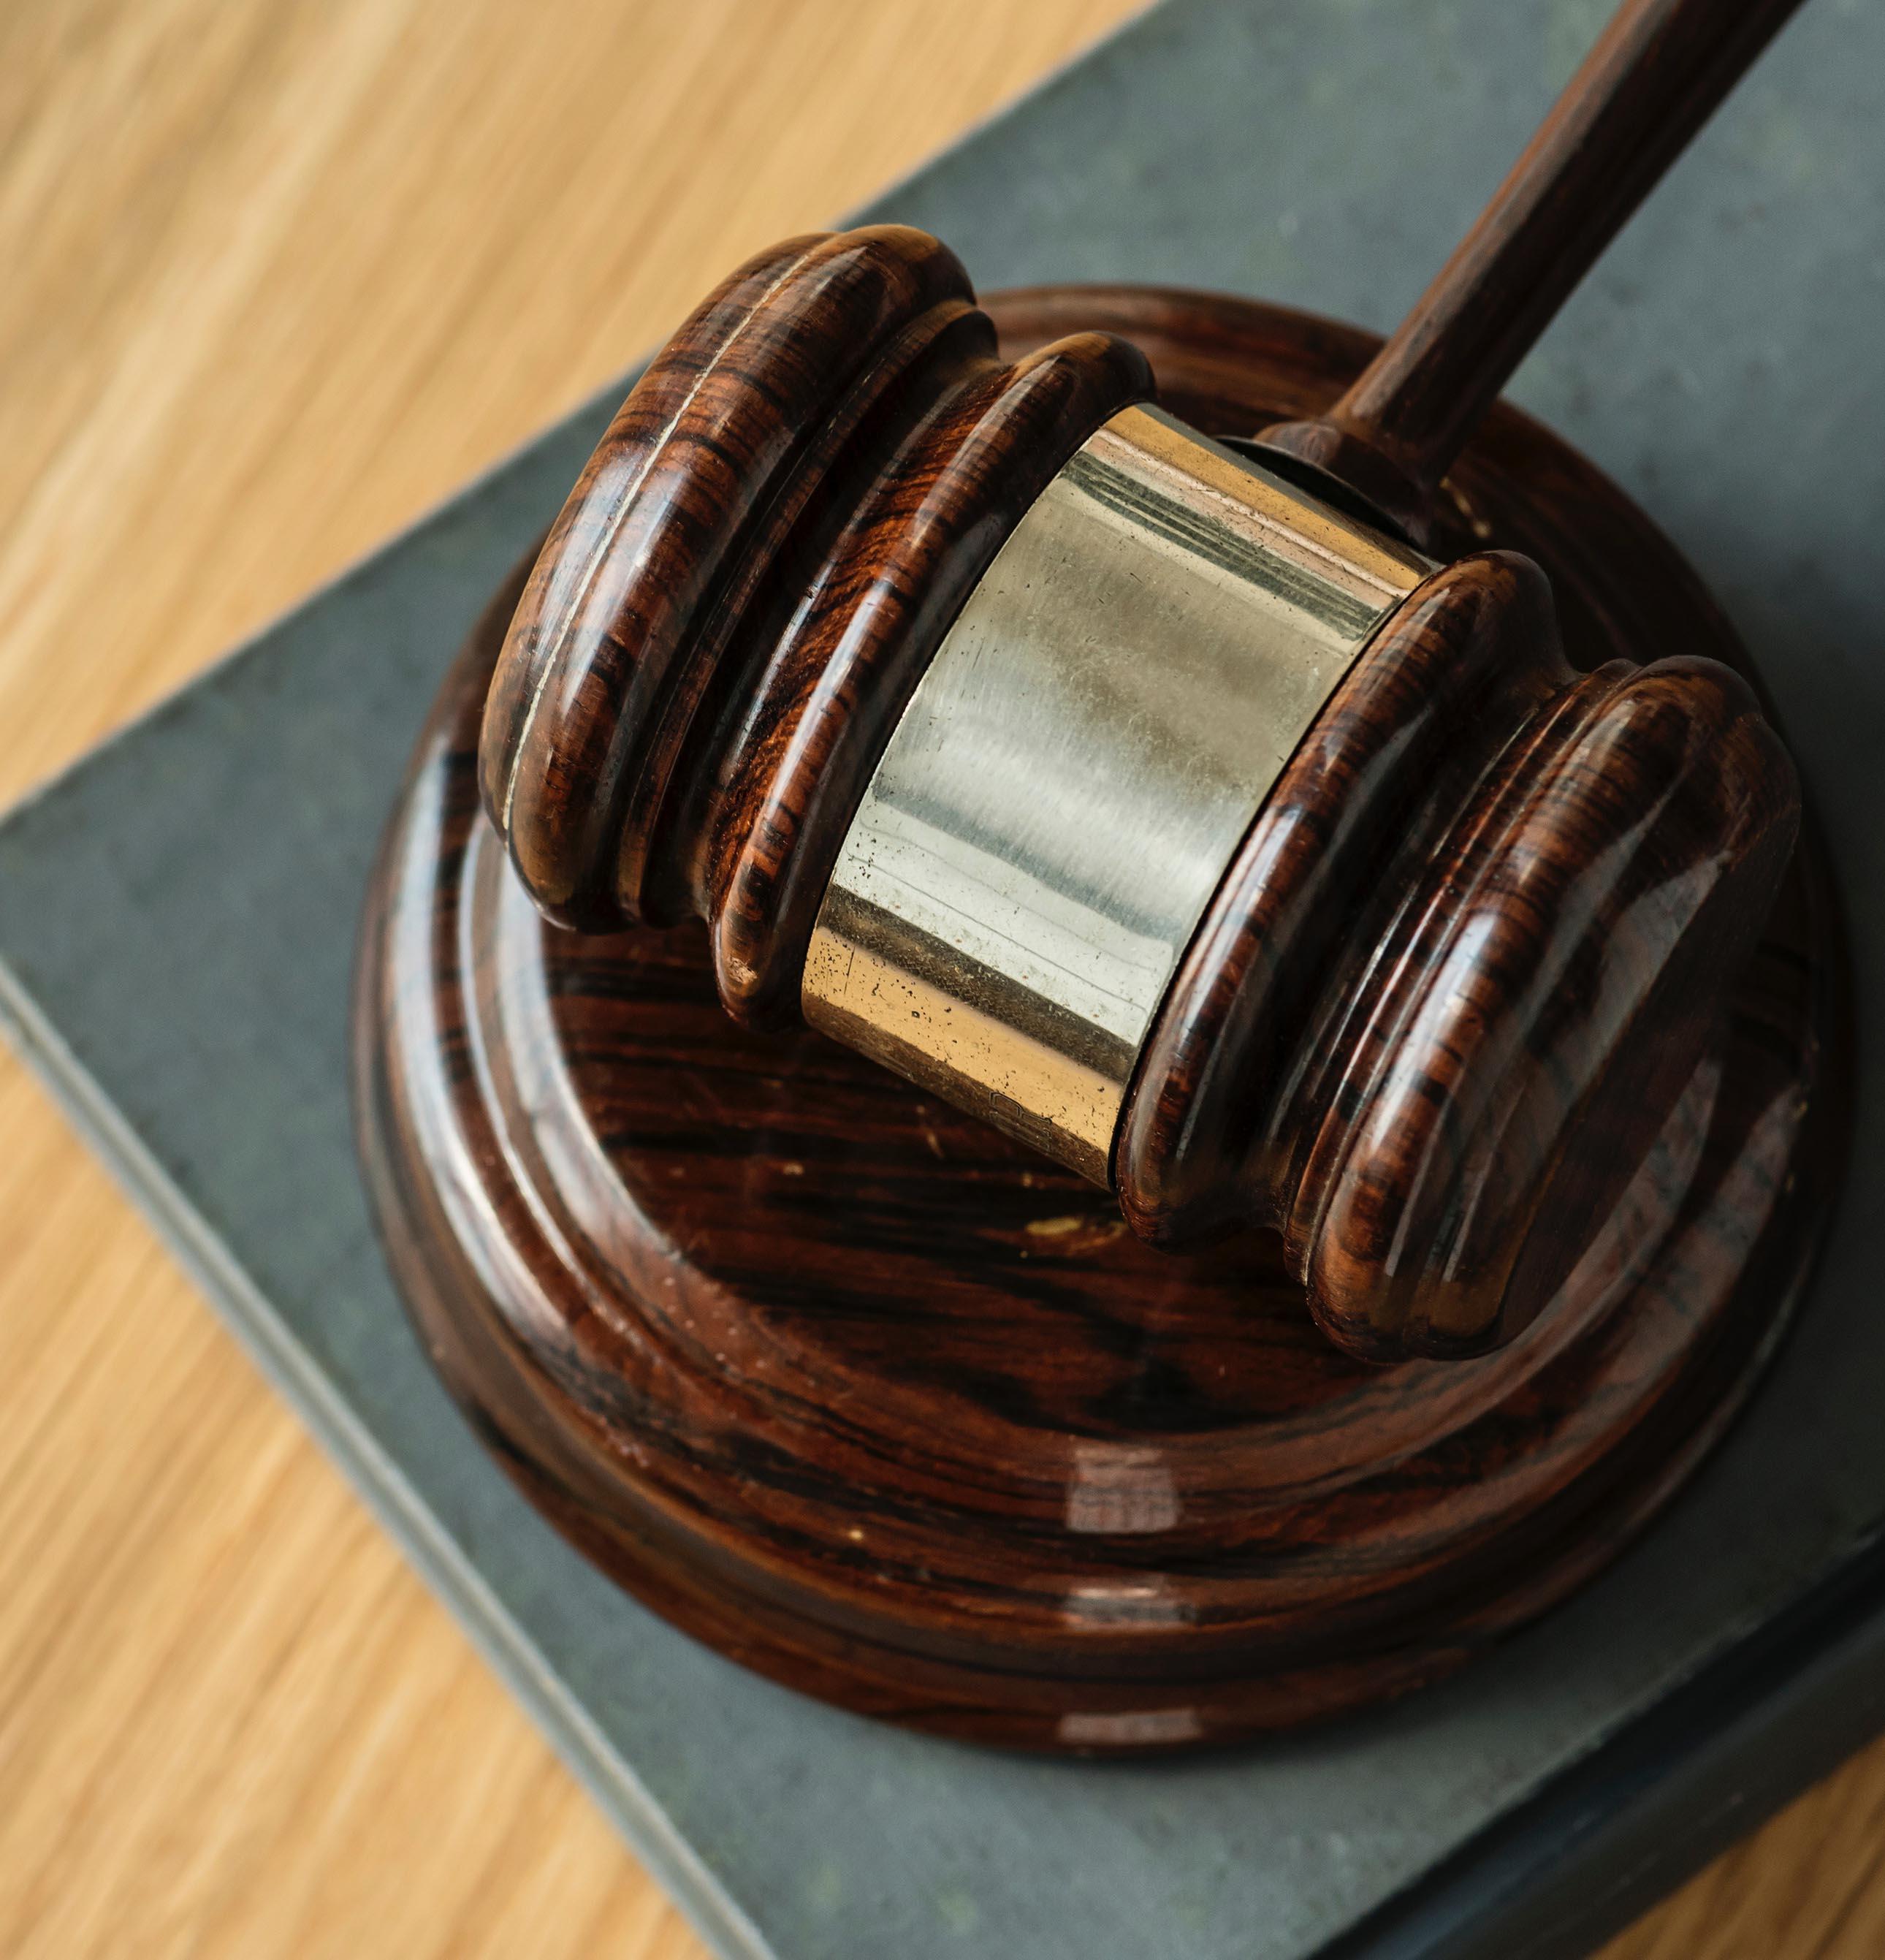 juez class actions Demandas colectivas versus ADR